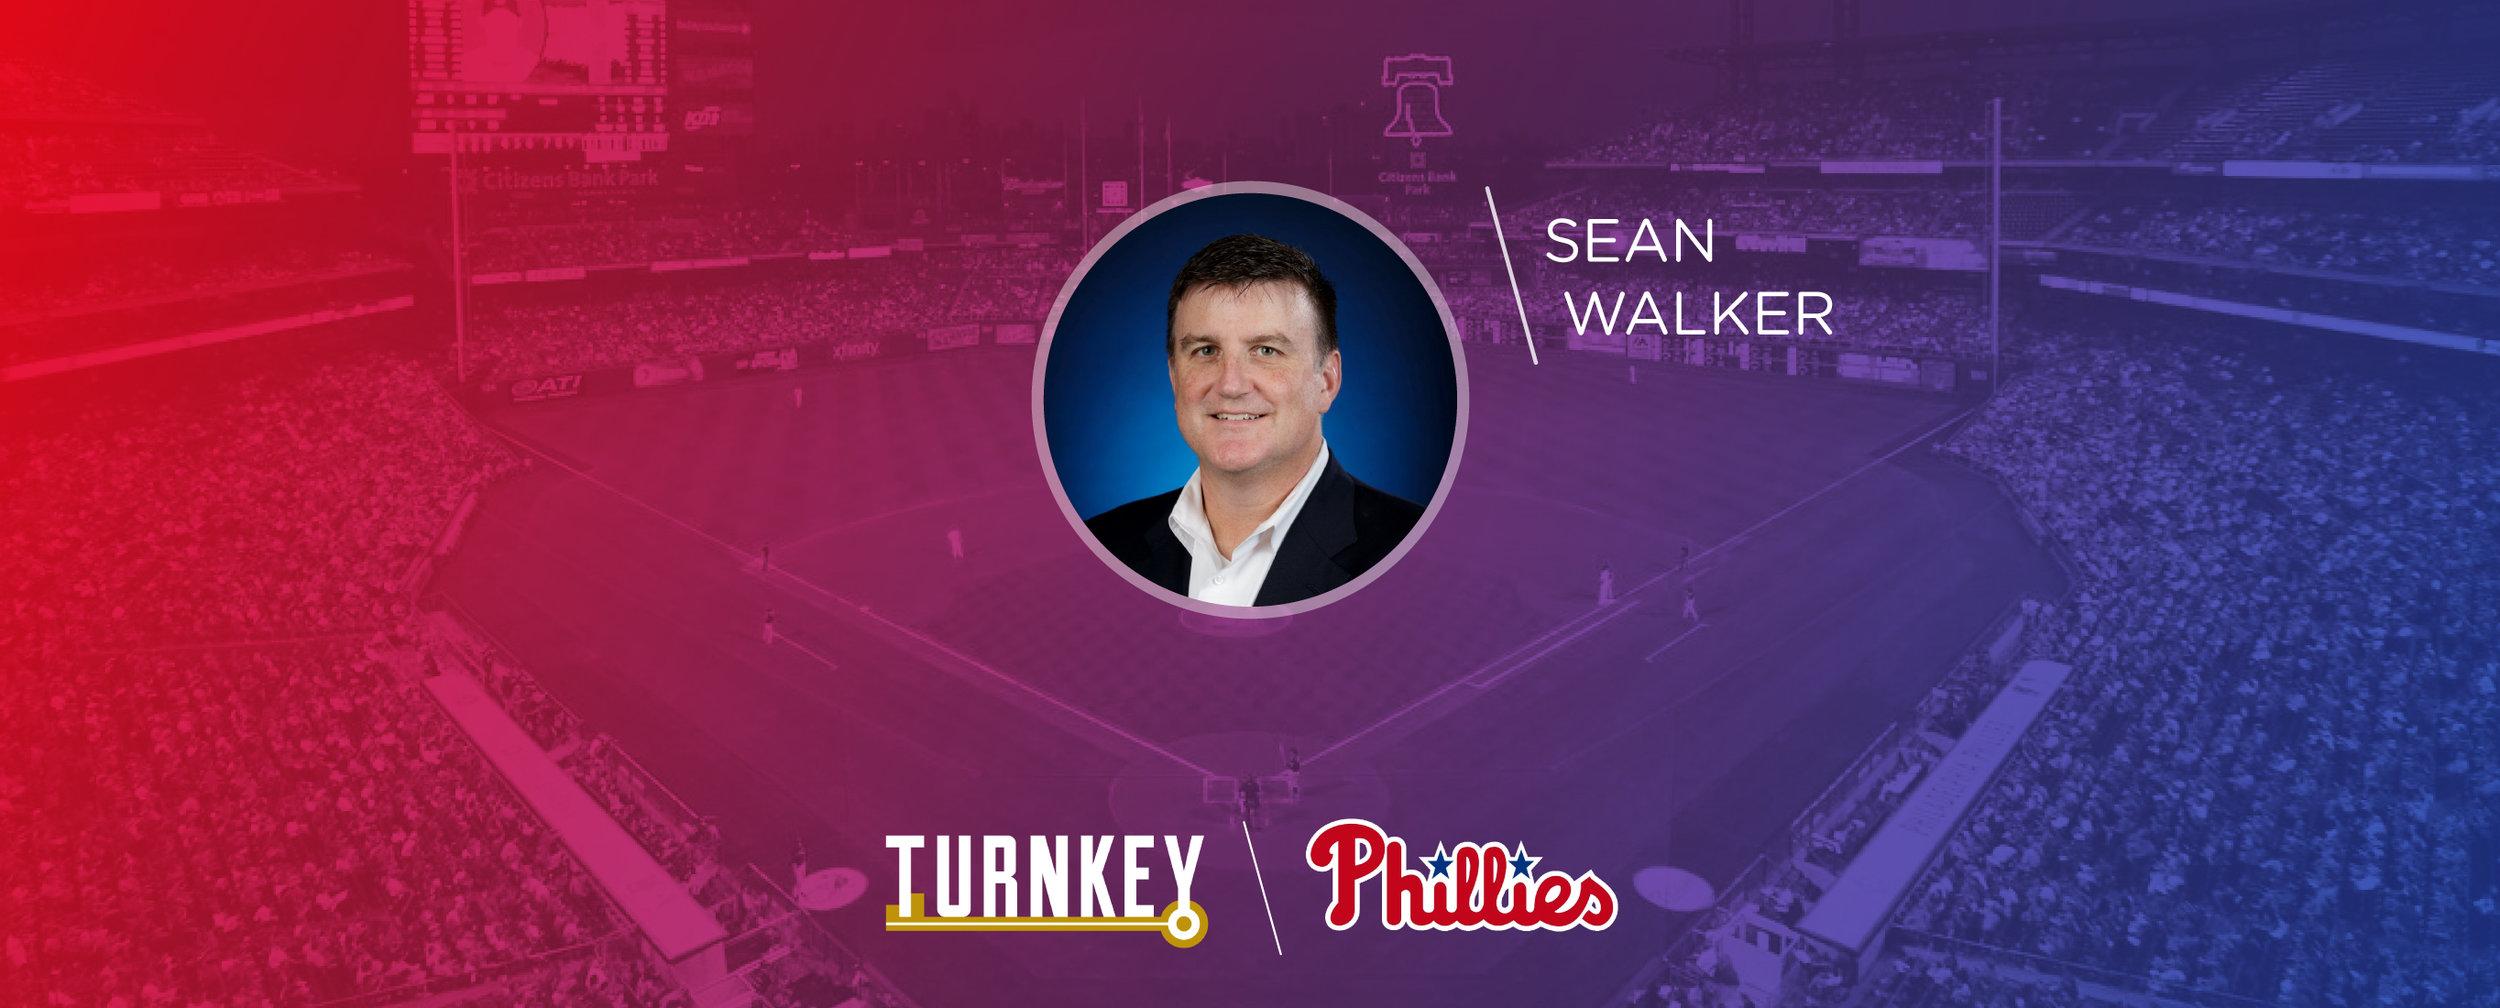 Turnkey-Phillies-Header.jpg